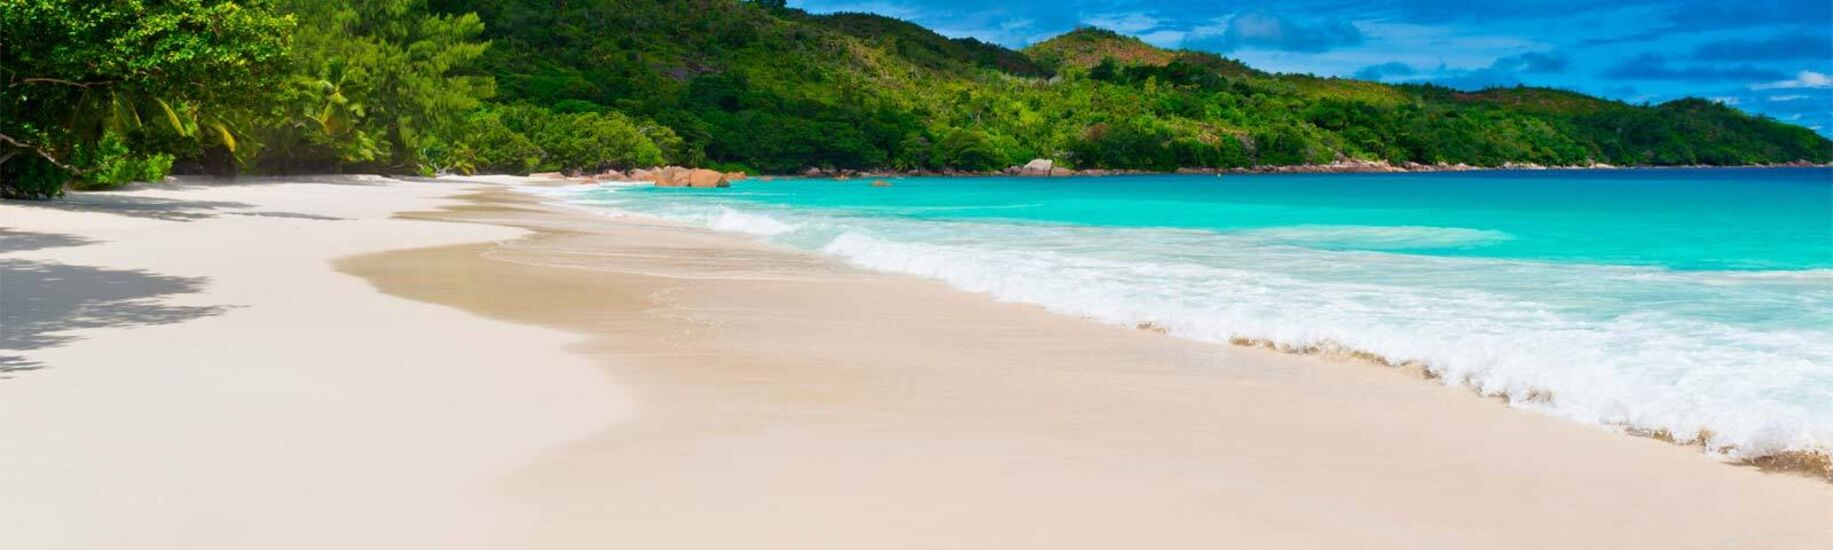 Luxury Beach Holidays Elegant Resorts